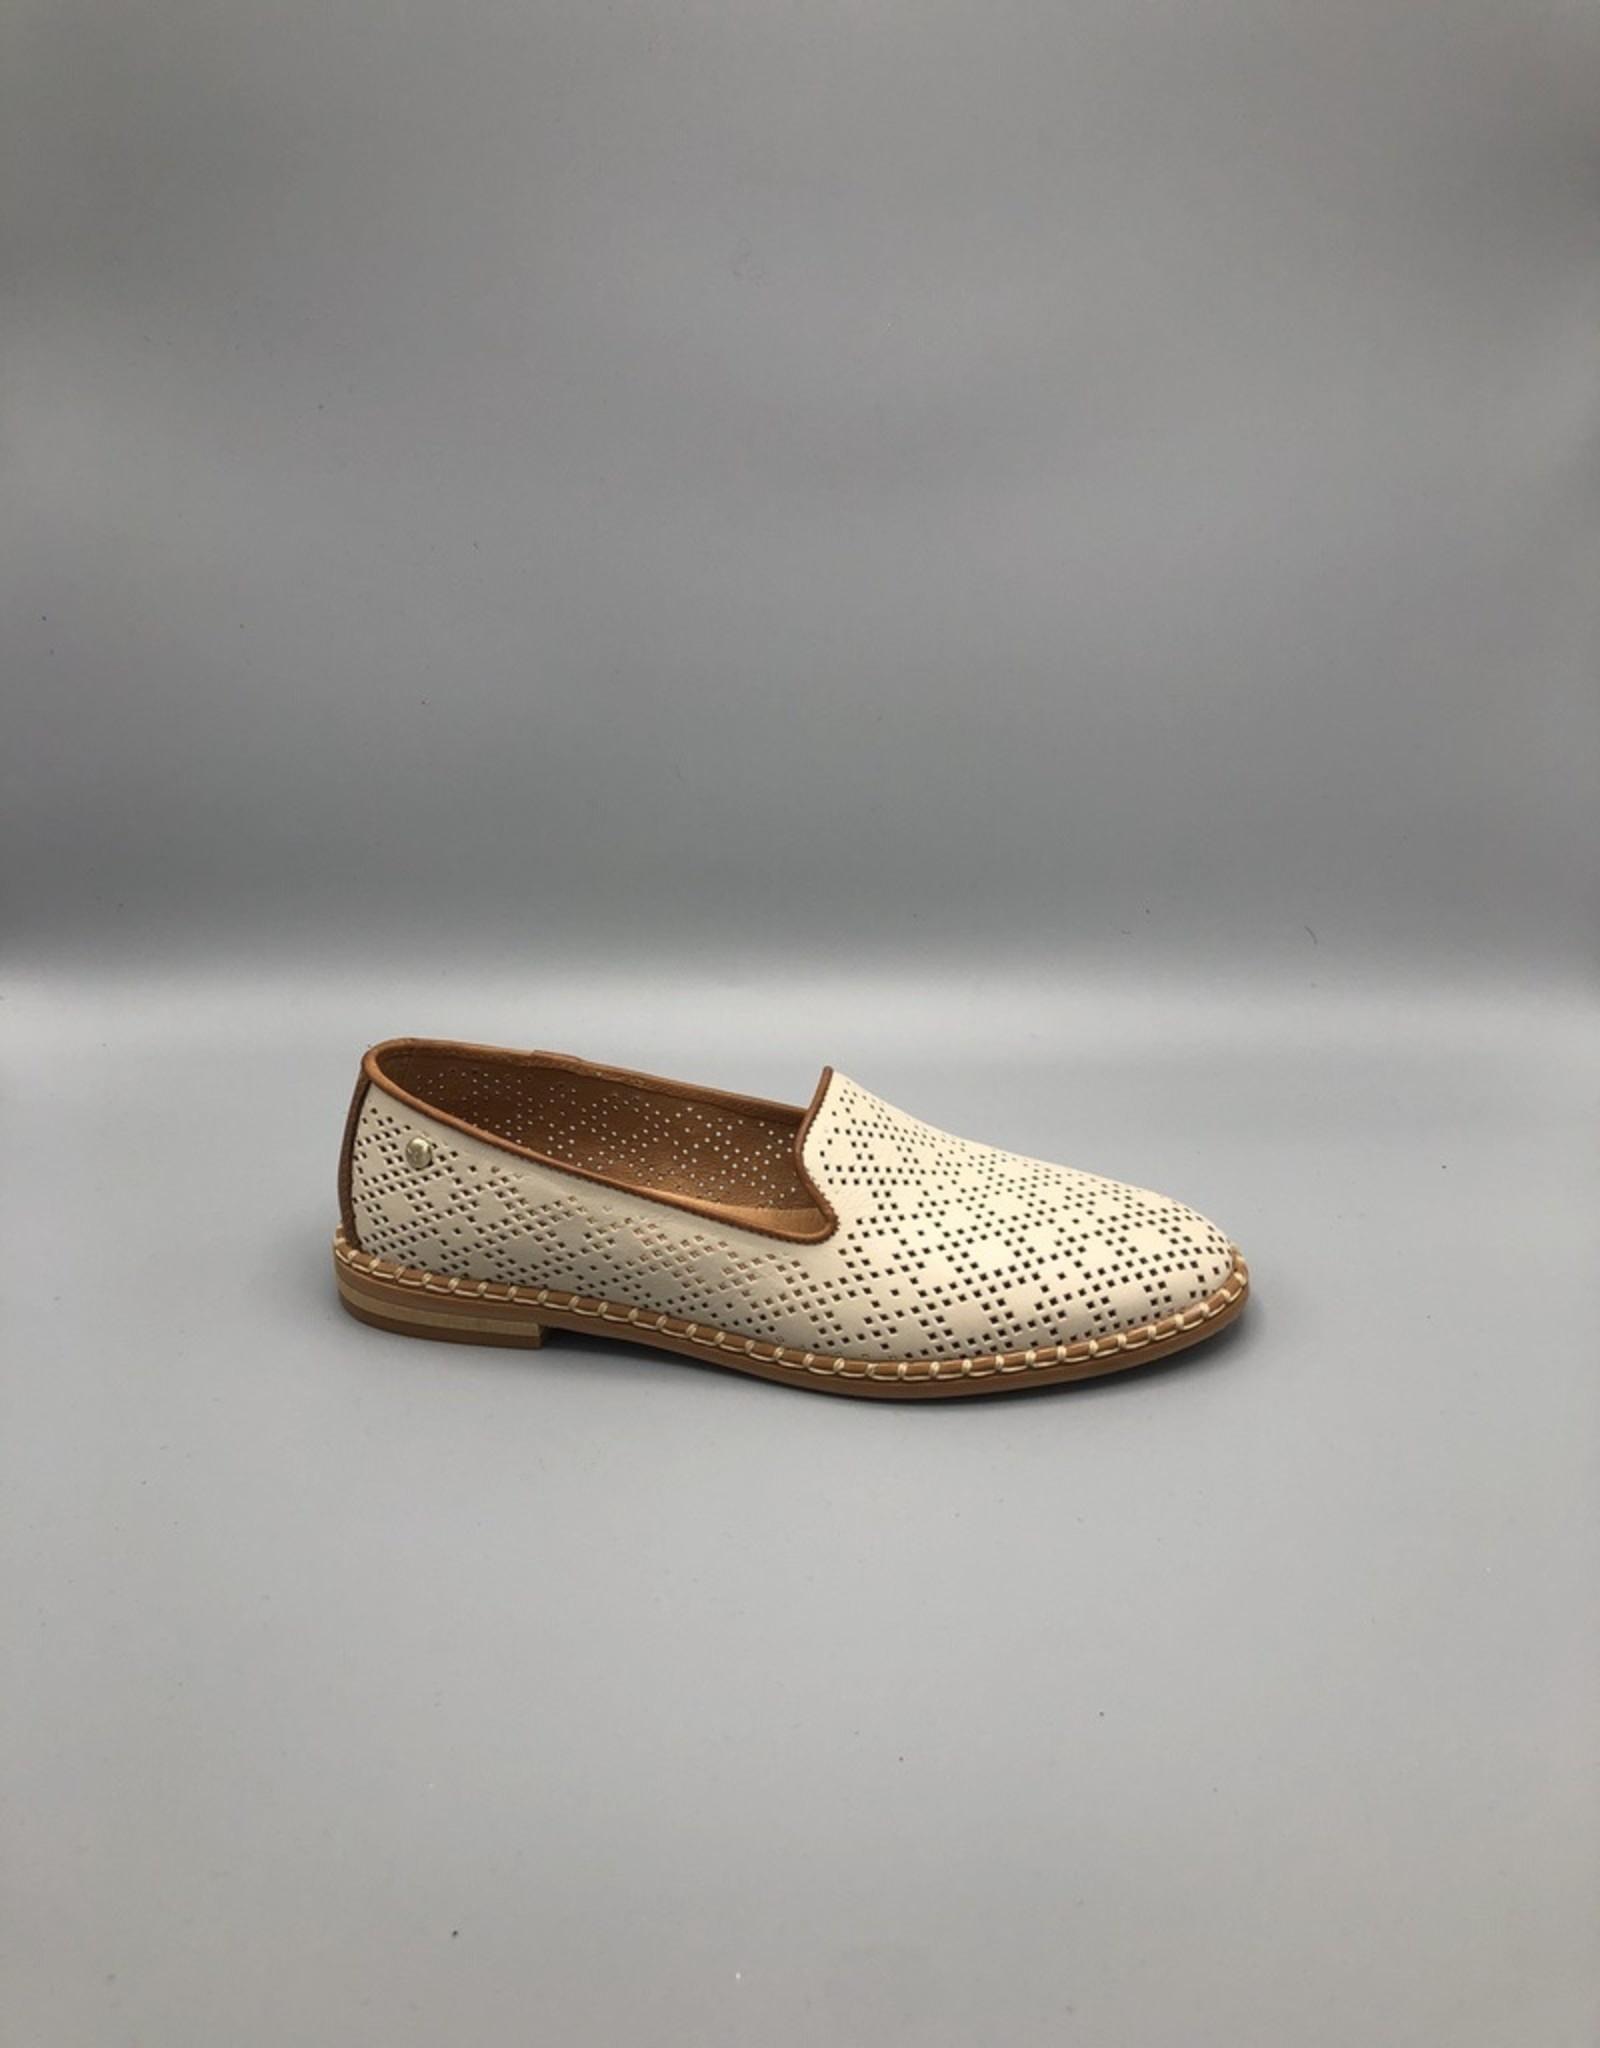 Pikolinos Merida Perforated Slip On Loafer